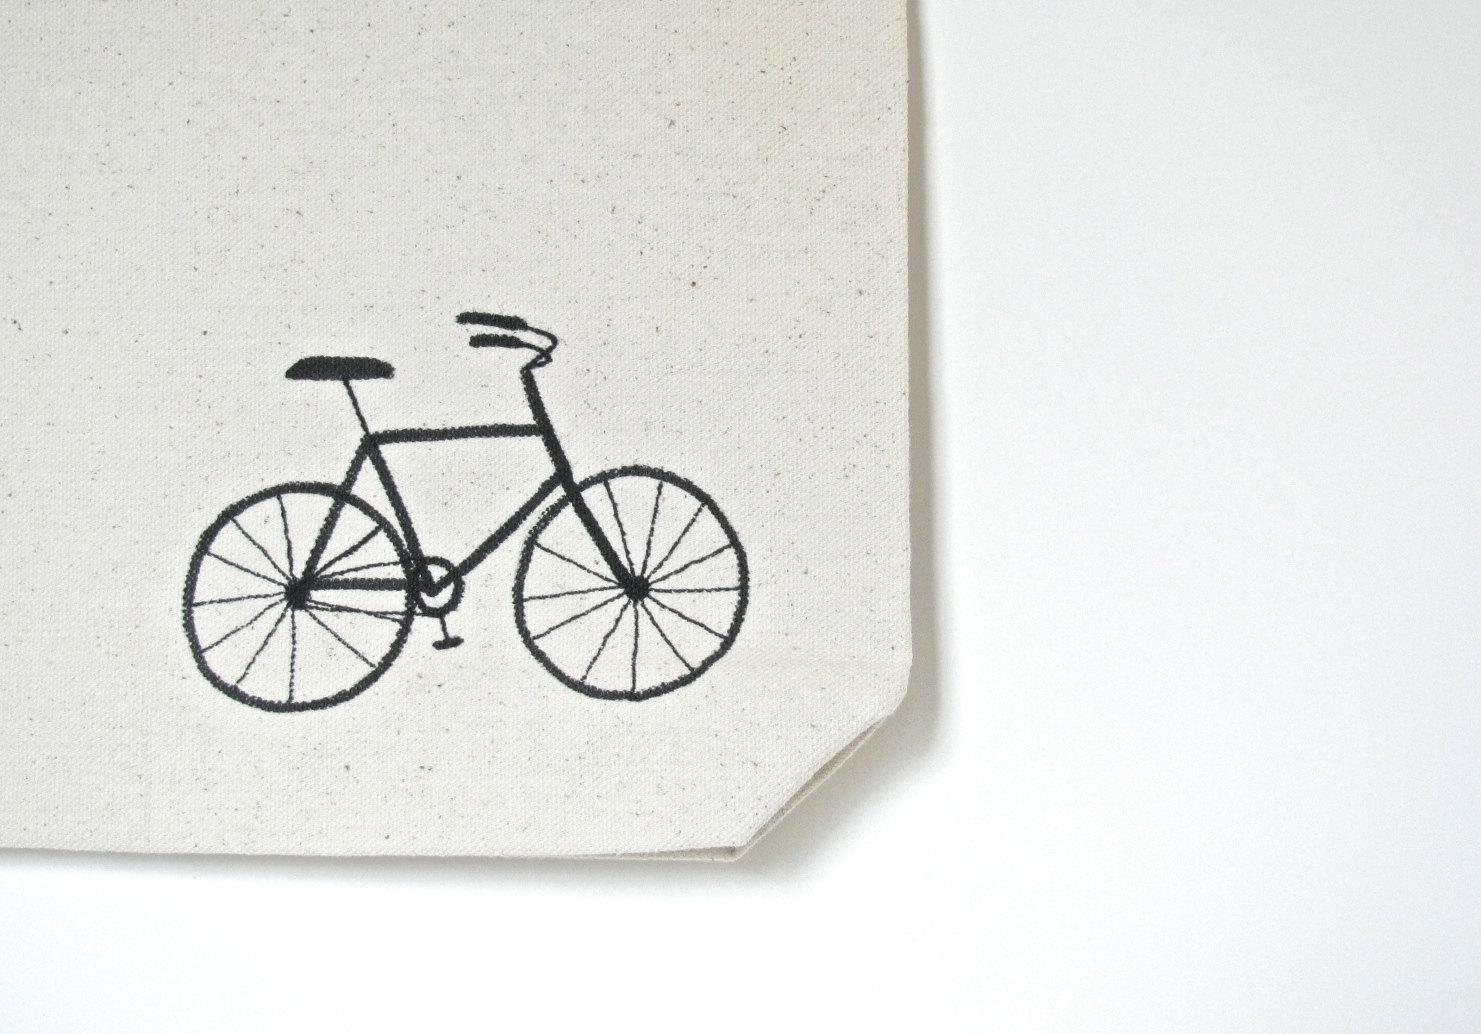 Drawn bicycle Drawn Bicycle Hand Like x